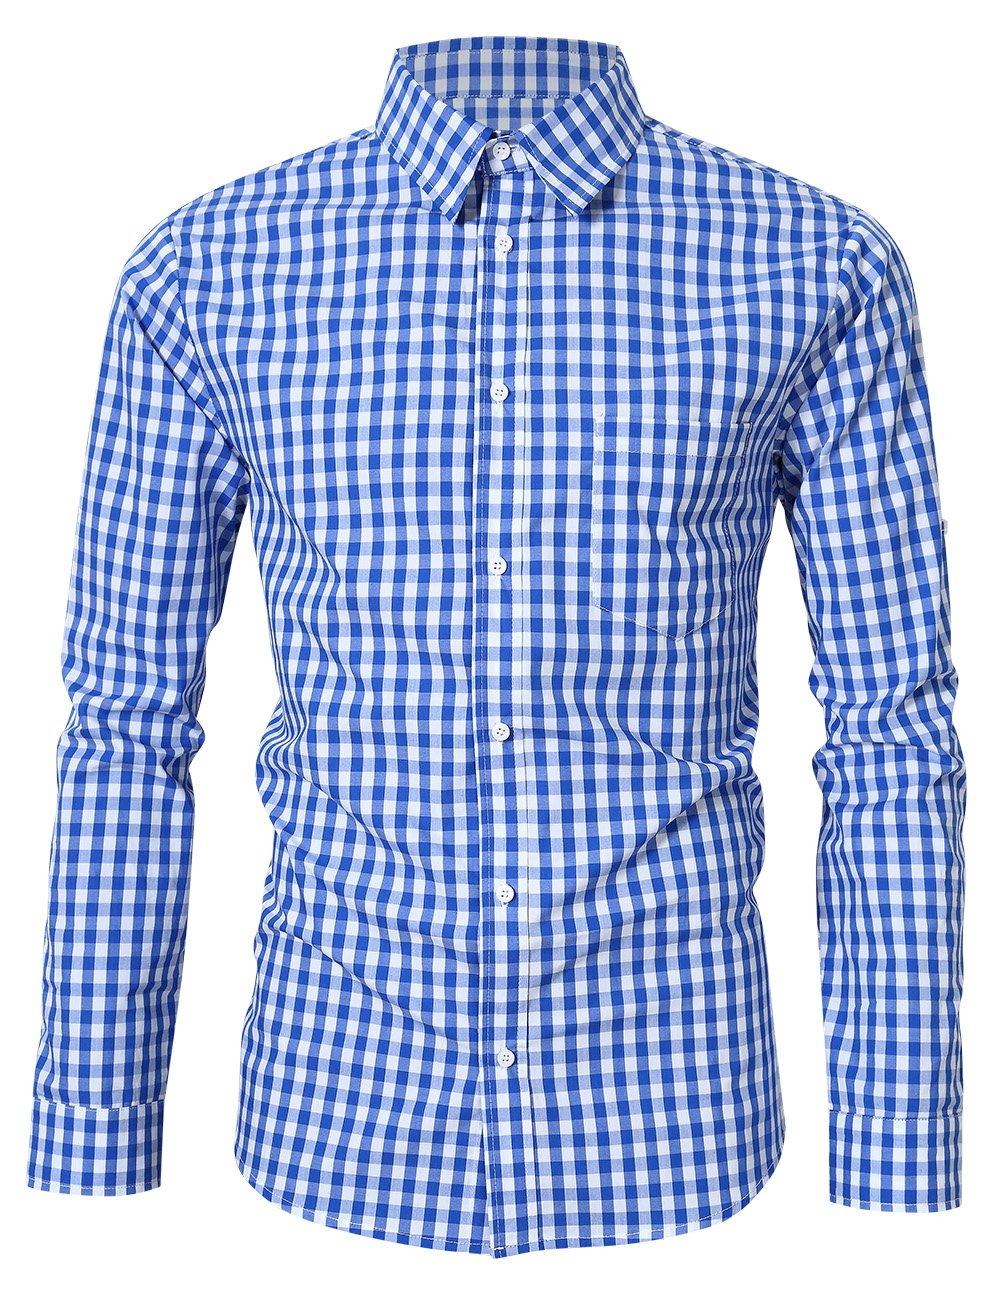 Clearlove Men's Casual Slim Fit Plaid Shirt Button Down Dress Shirts for German Bavarian Oktoberfest Blue L